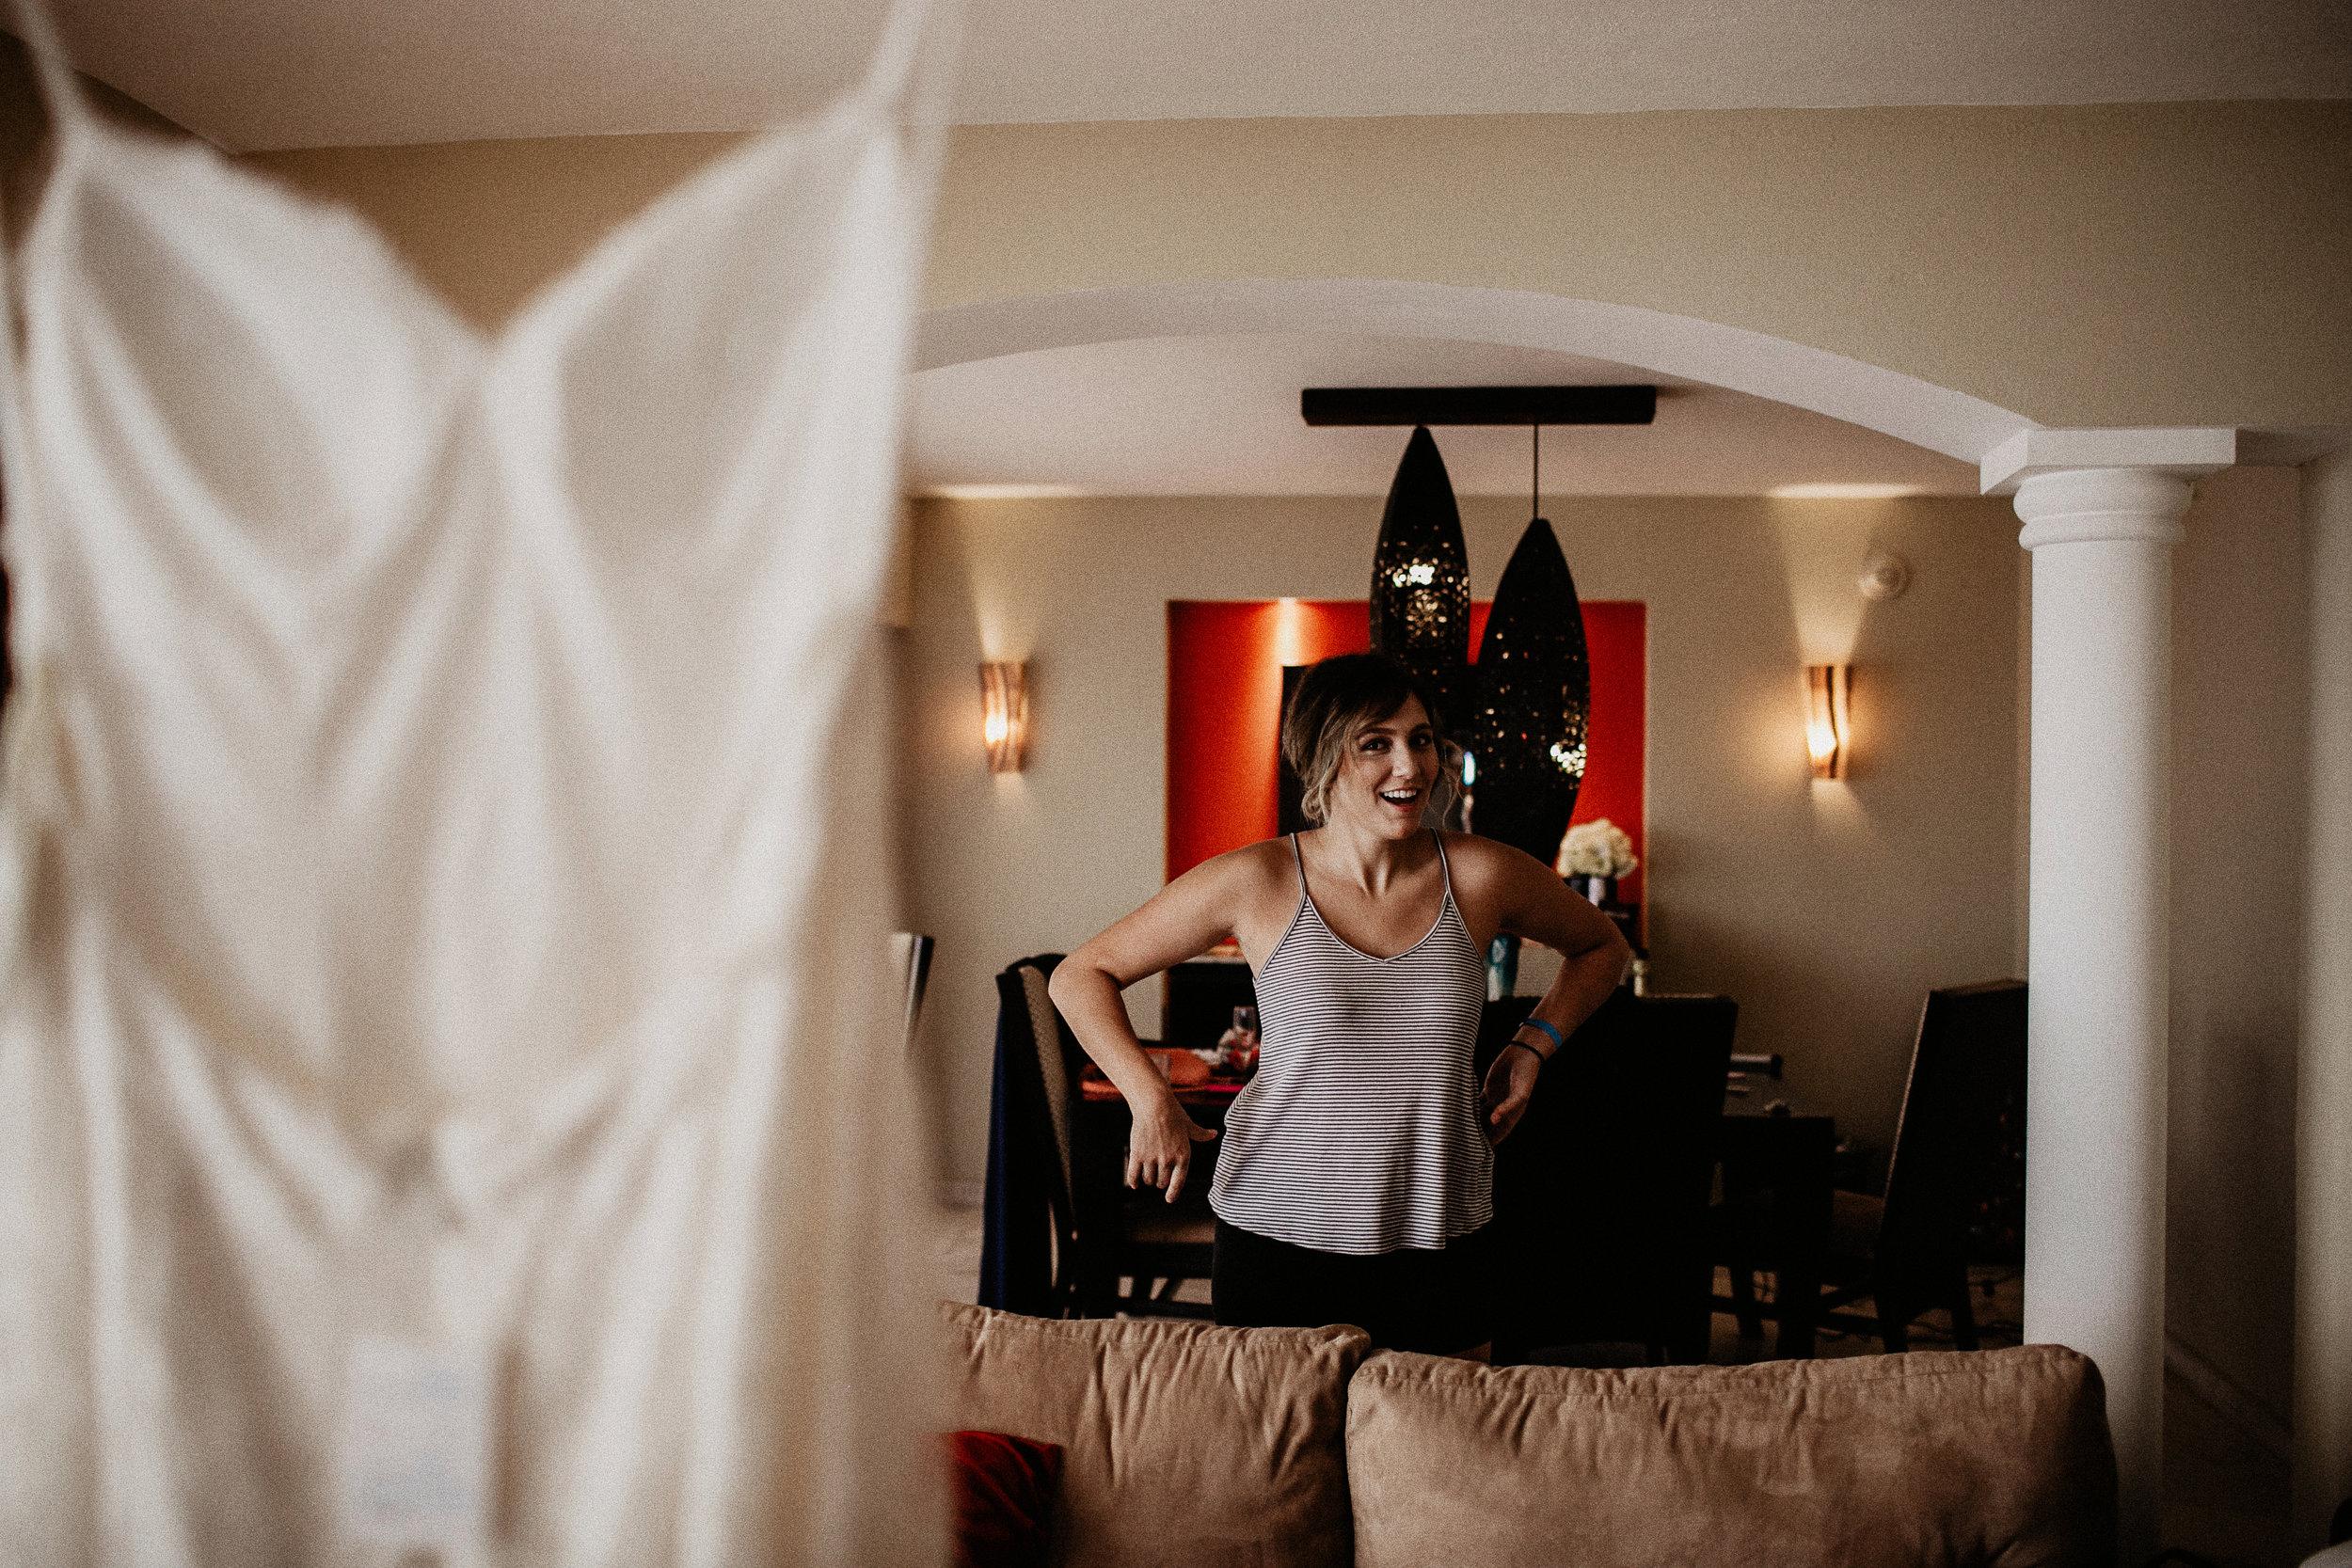 alfonso_flores_destination_wedding_photography_puerto_vallarta_hotel_barcelo_vallarta_cuttler_amela-117.JPG